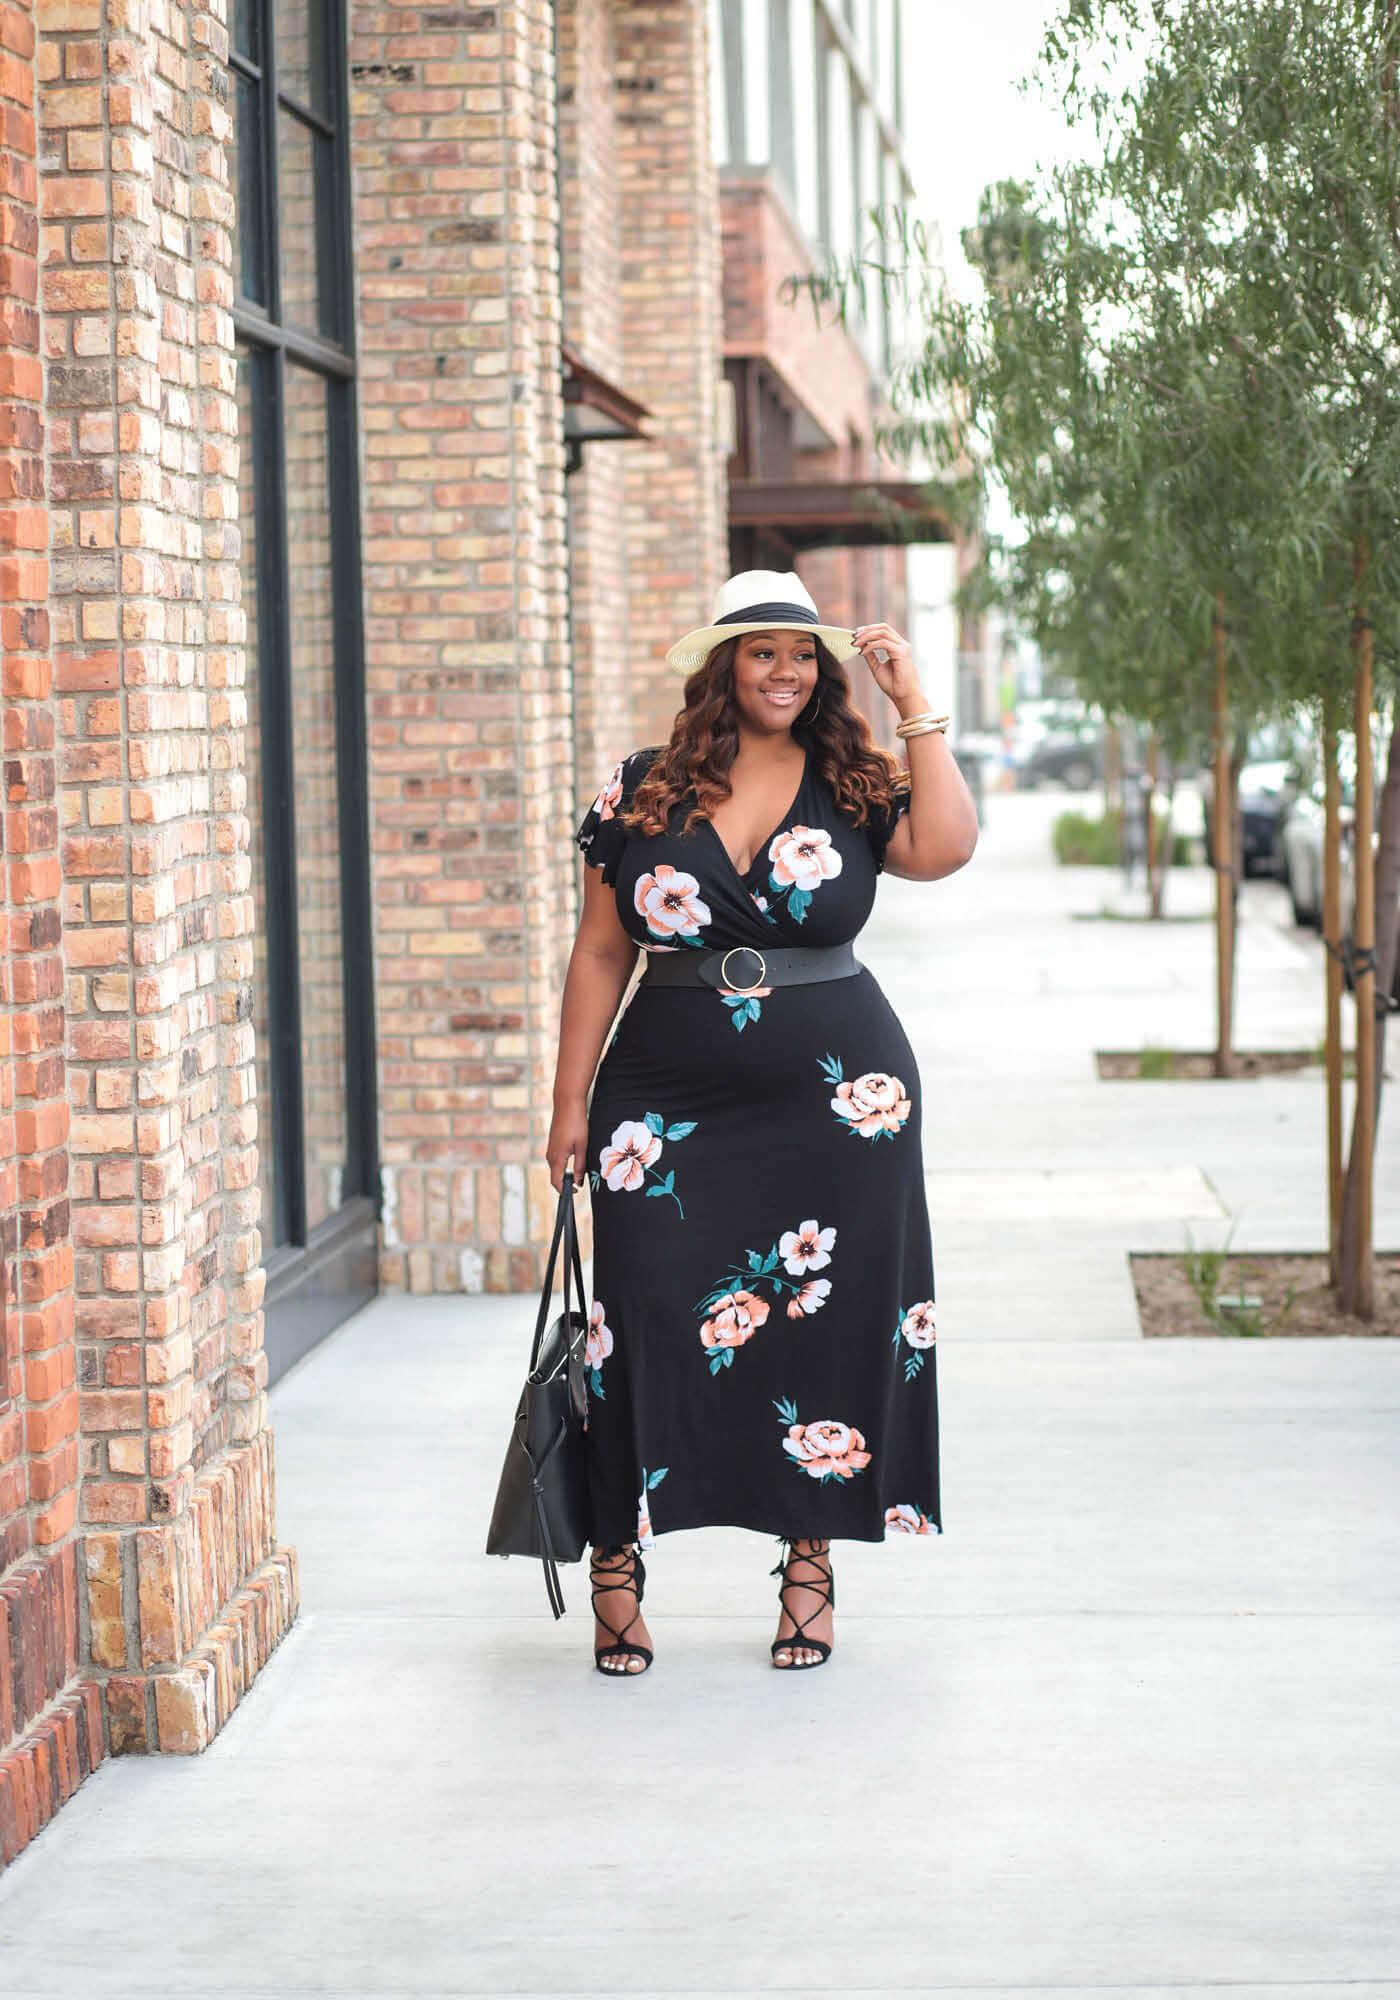 My Body My Style: Kristine of Trendy Curvy